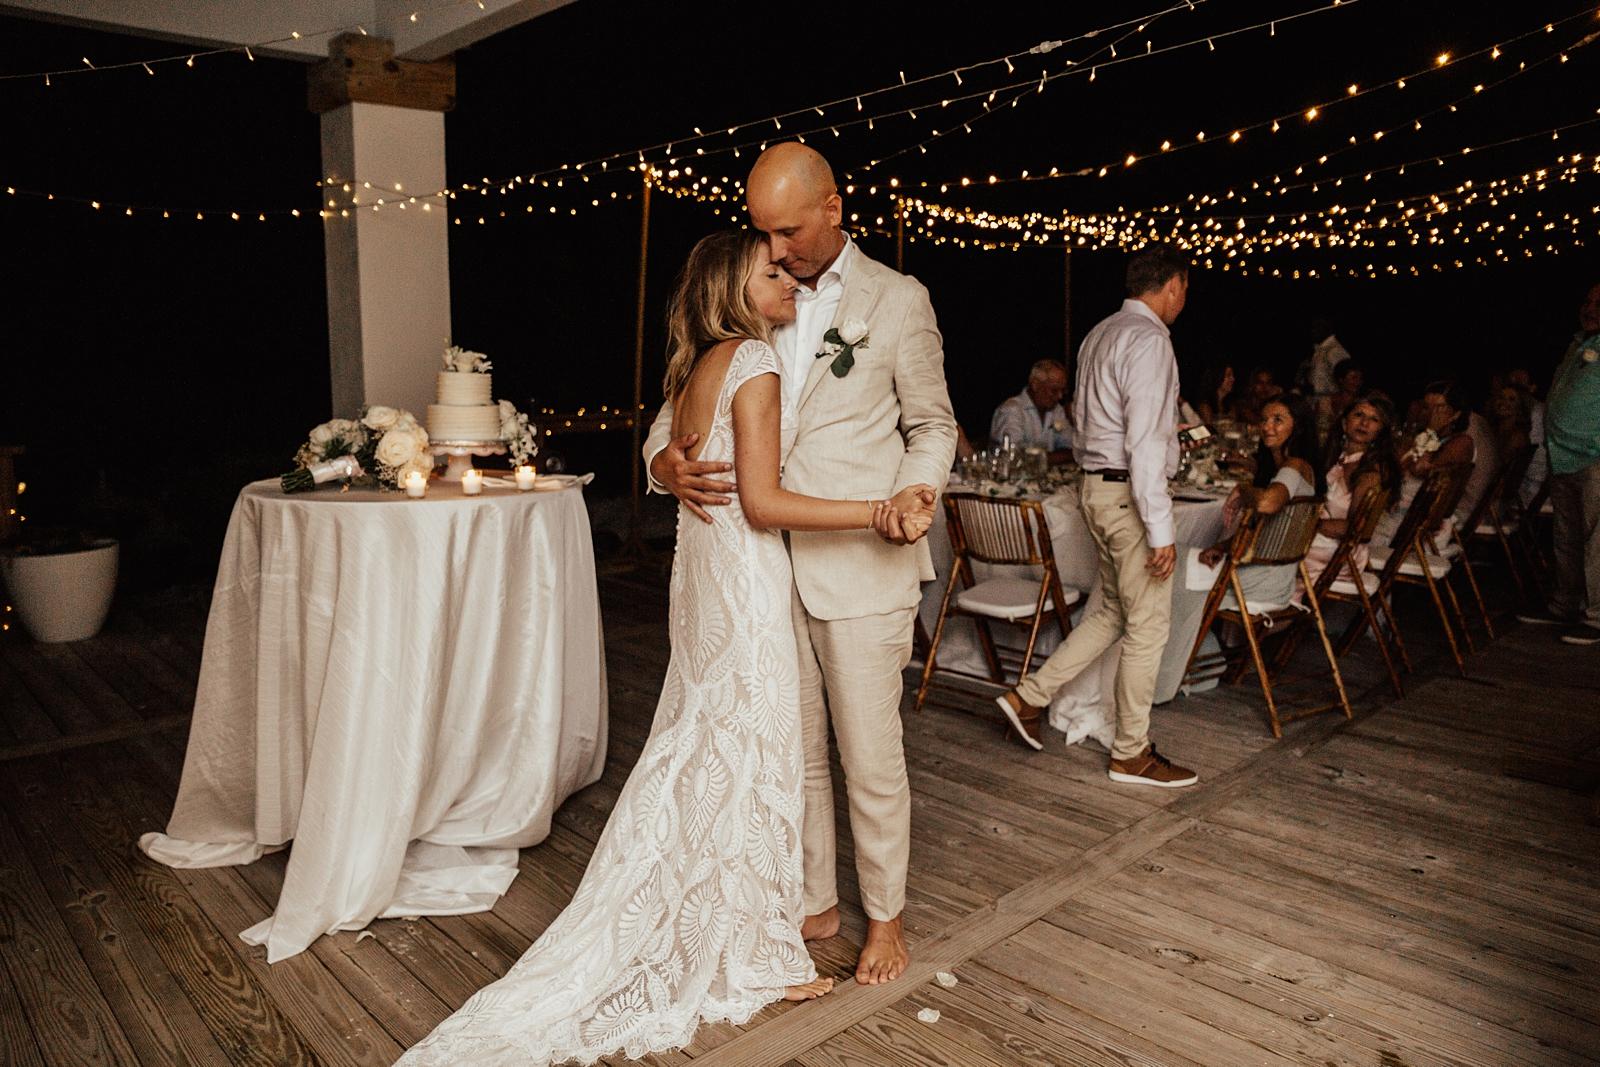 Jenni & Andrew Intimate Beach Destination Wedding in Little Exuma, Bahamas_0540.jpg